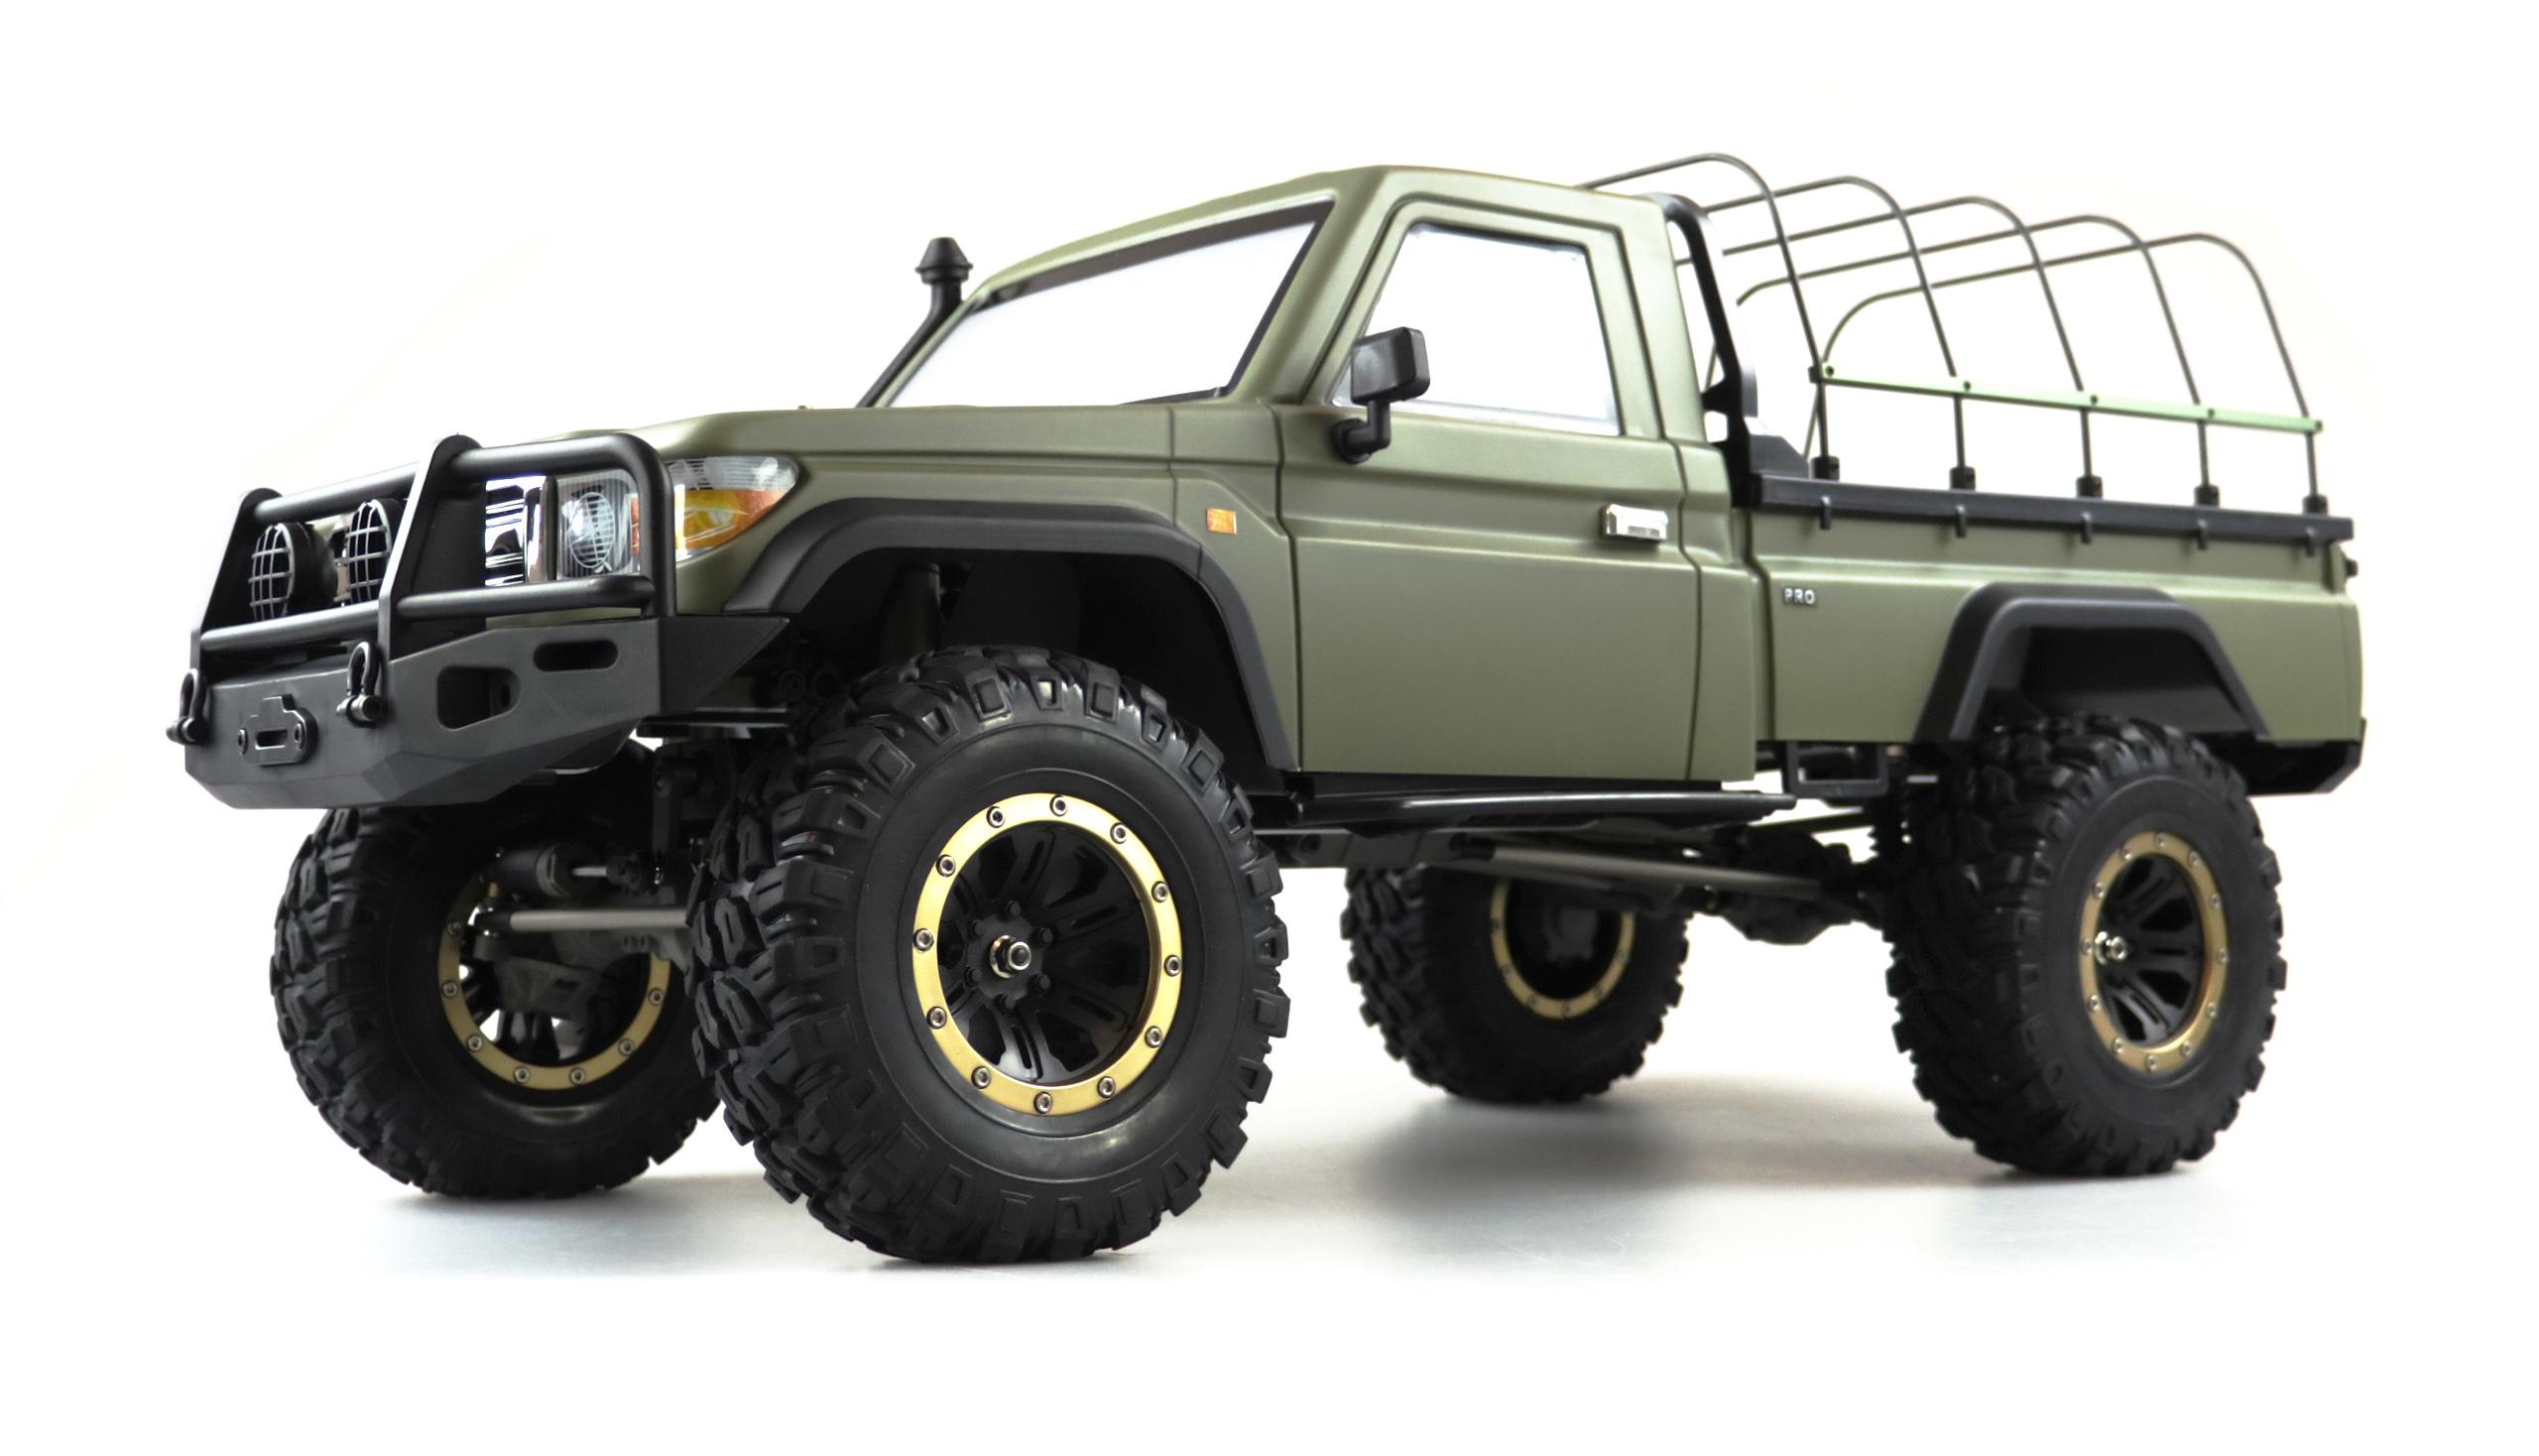 Amewi AMXROCK RCX8BS - Funkgesteuerter (RC) Lastwagen - Elektromotor - 1:8 - Betriebsbereit (RTR) - Grün - Junge/Mädchen